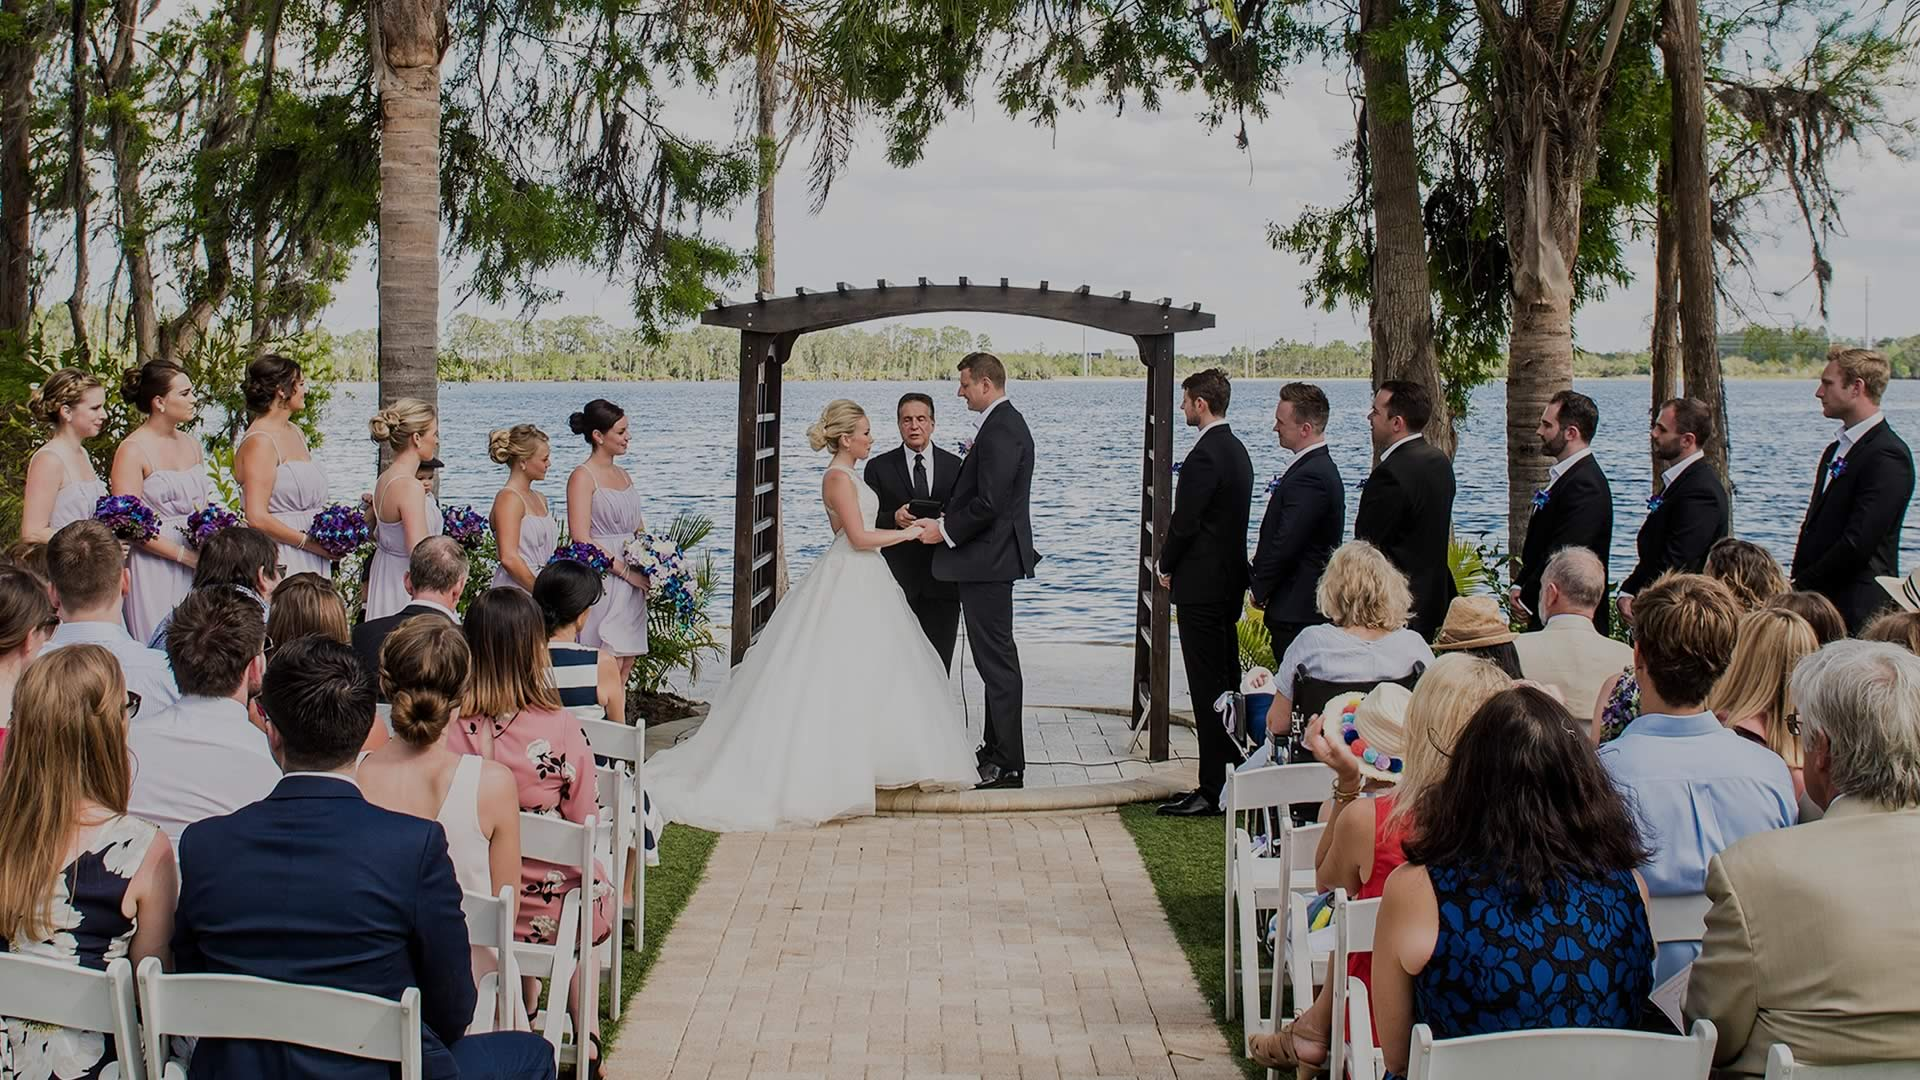 Paradise Cove 1 - Sensational Ceremonies